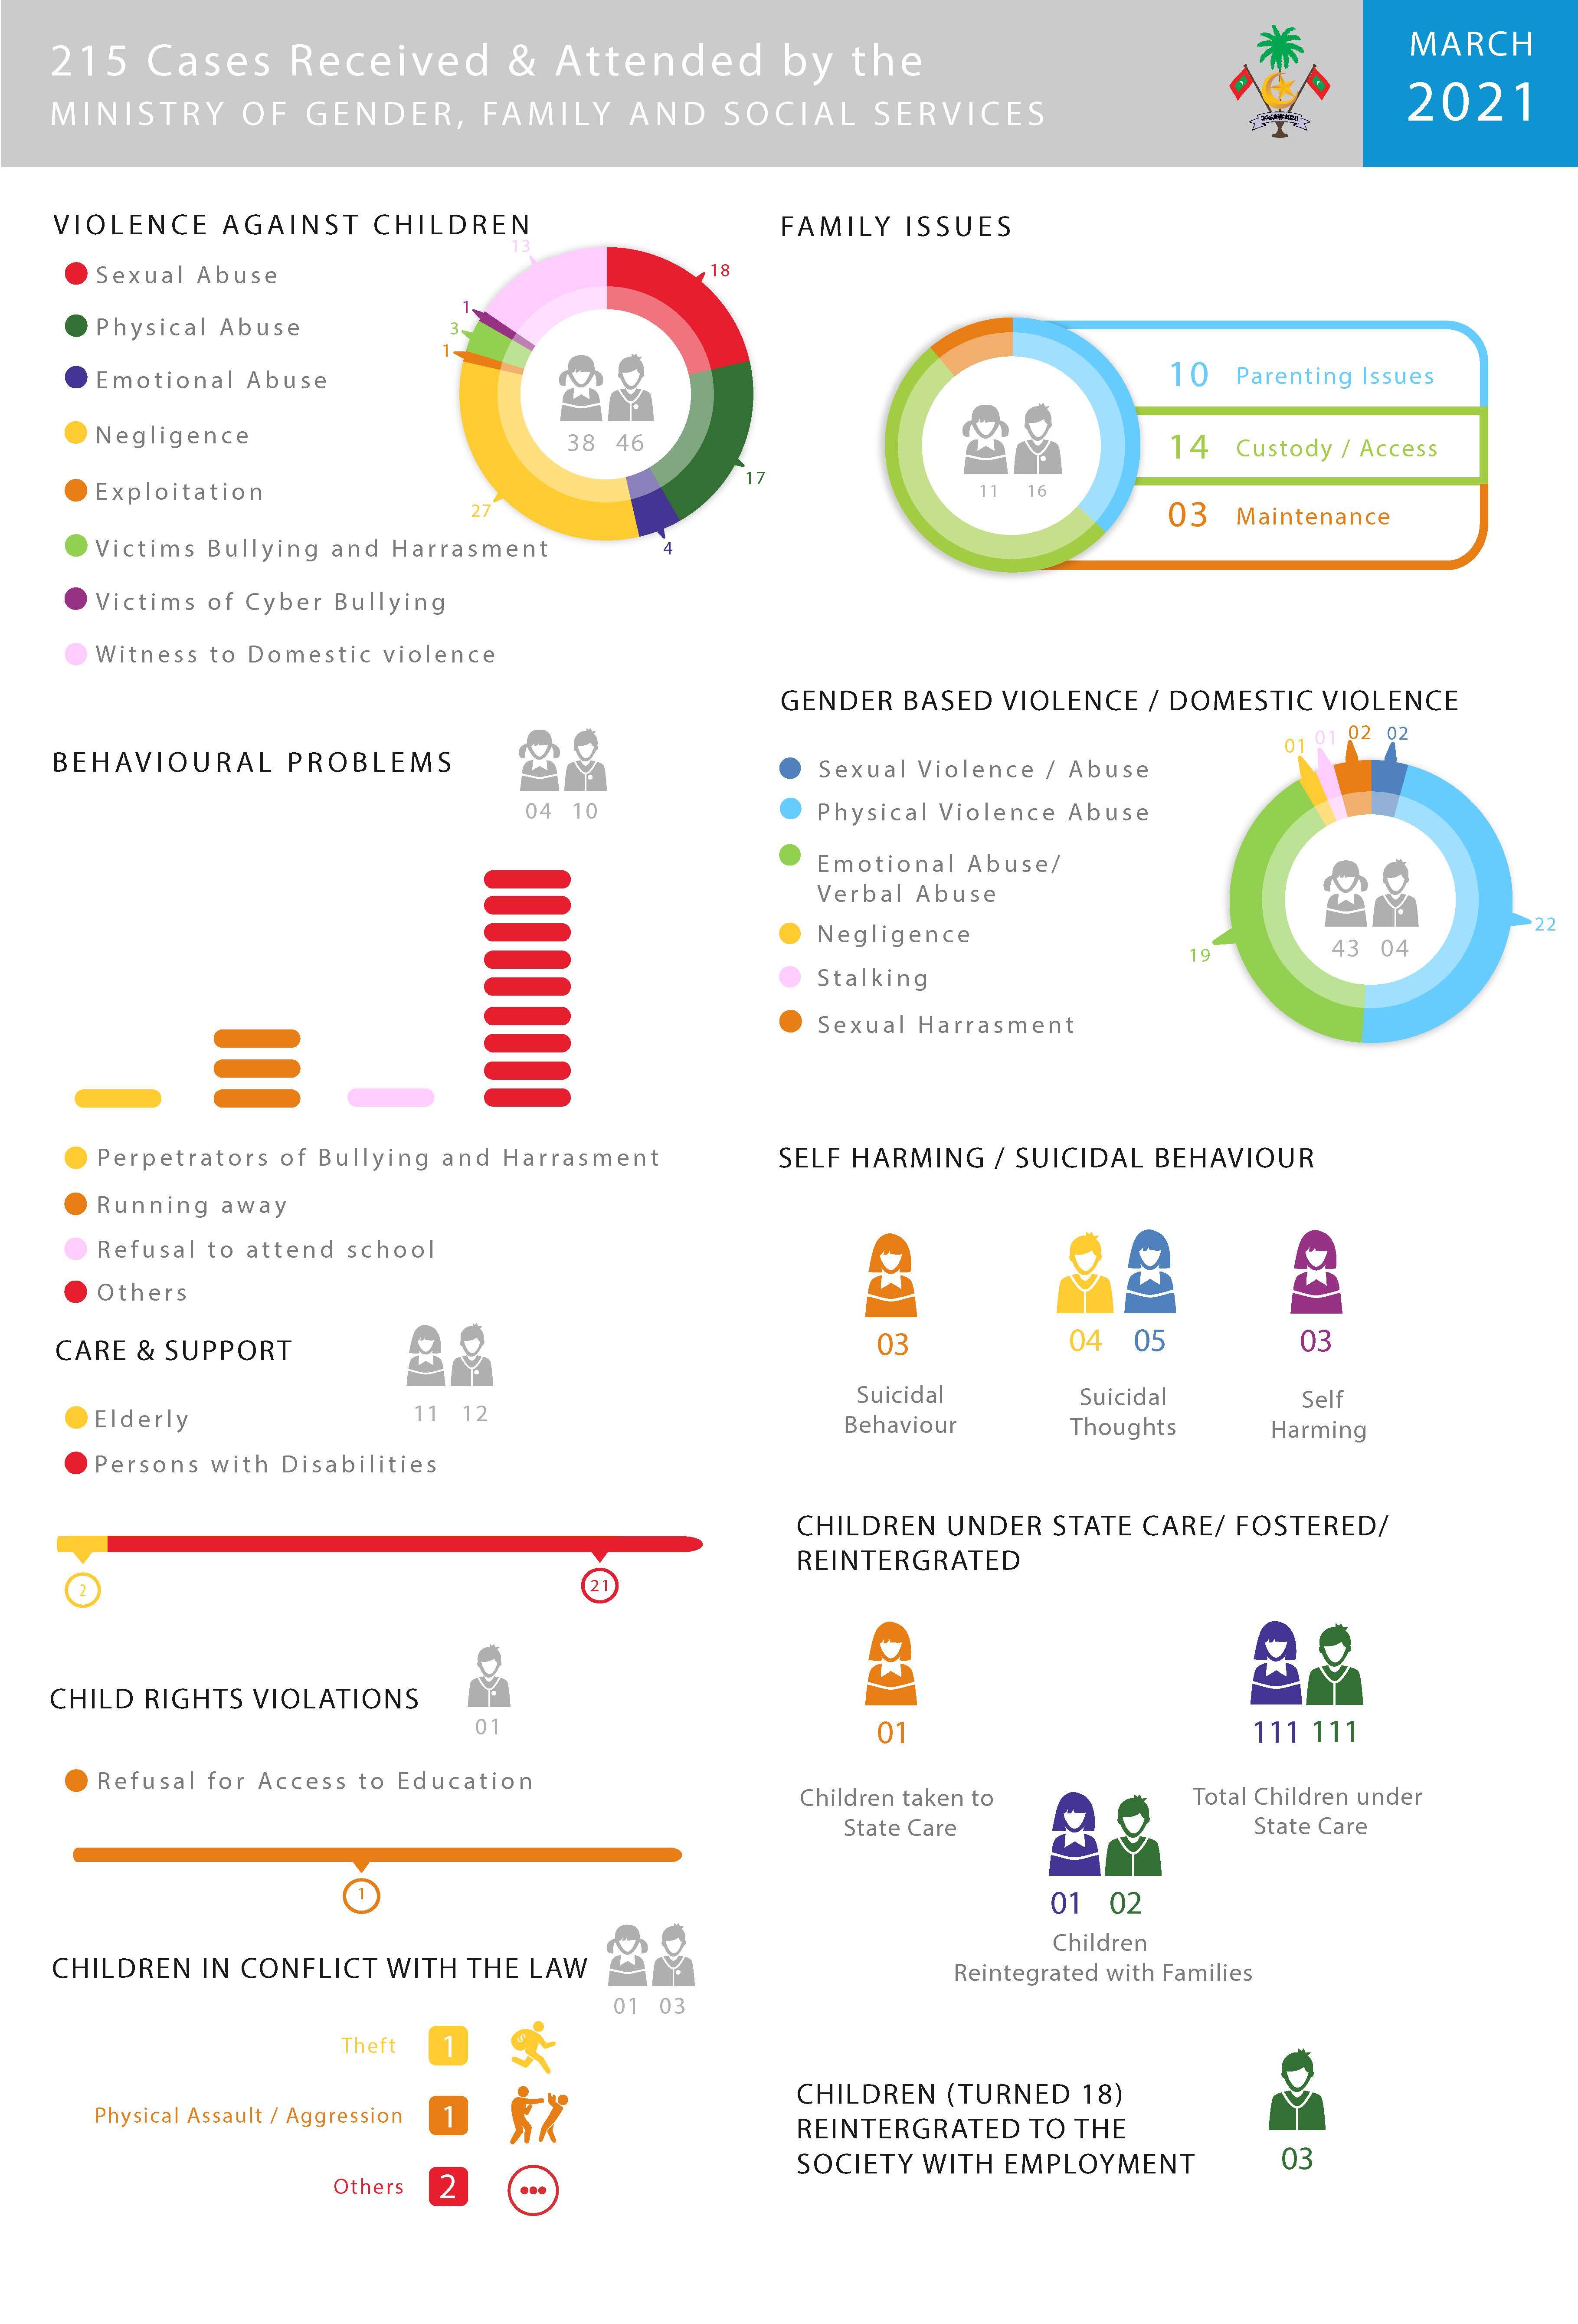 March 2021 case statistics